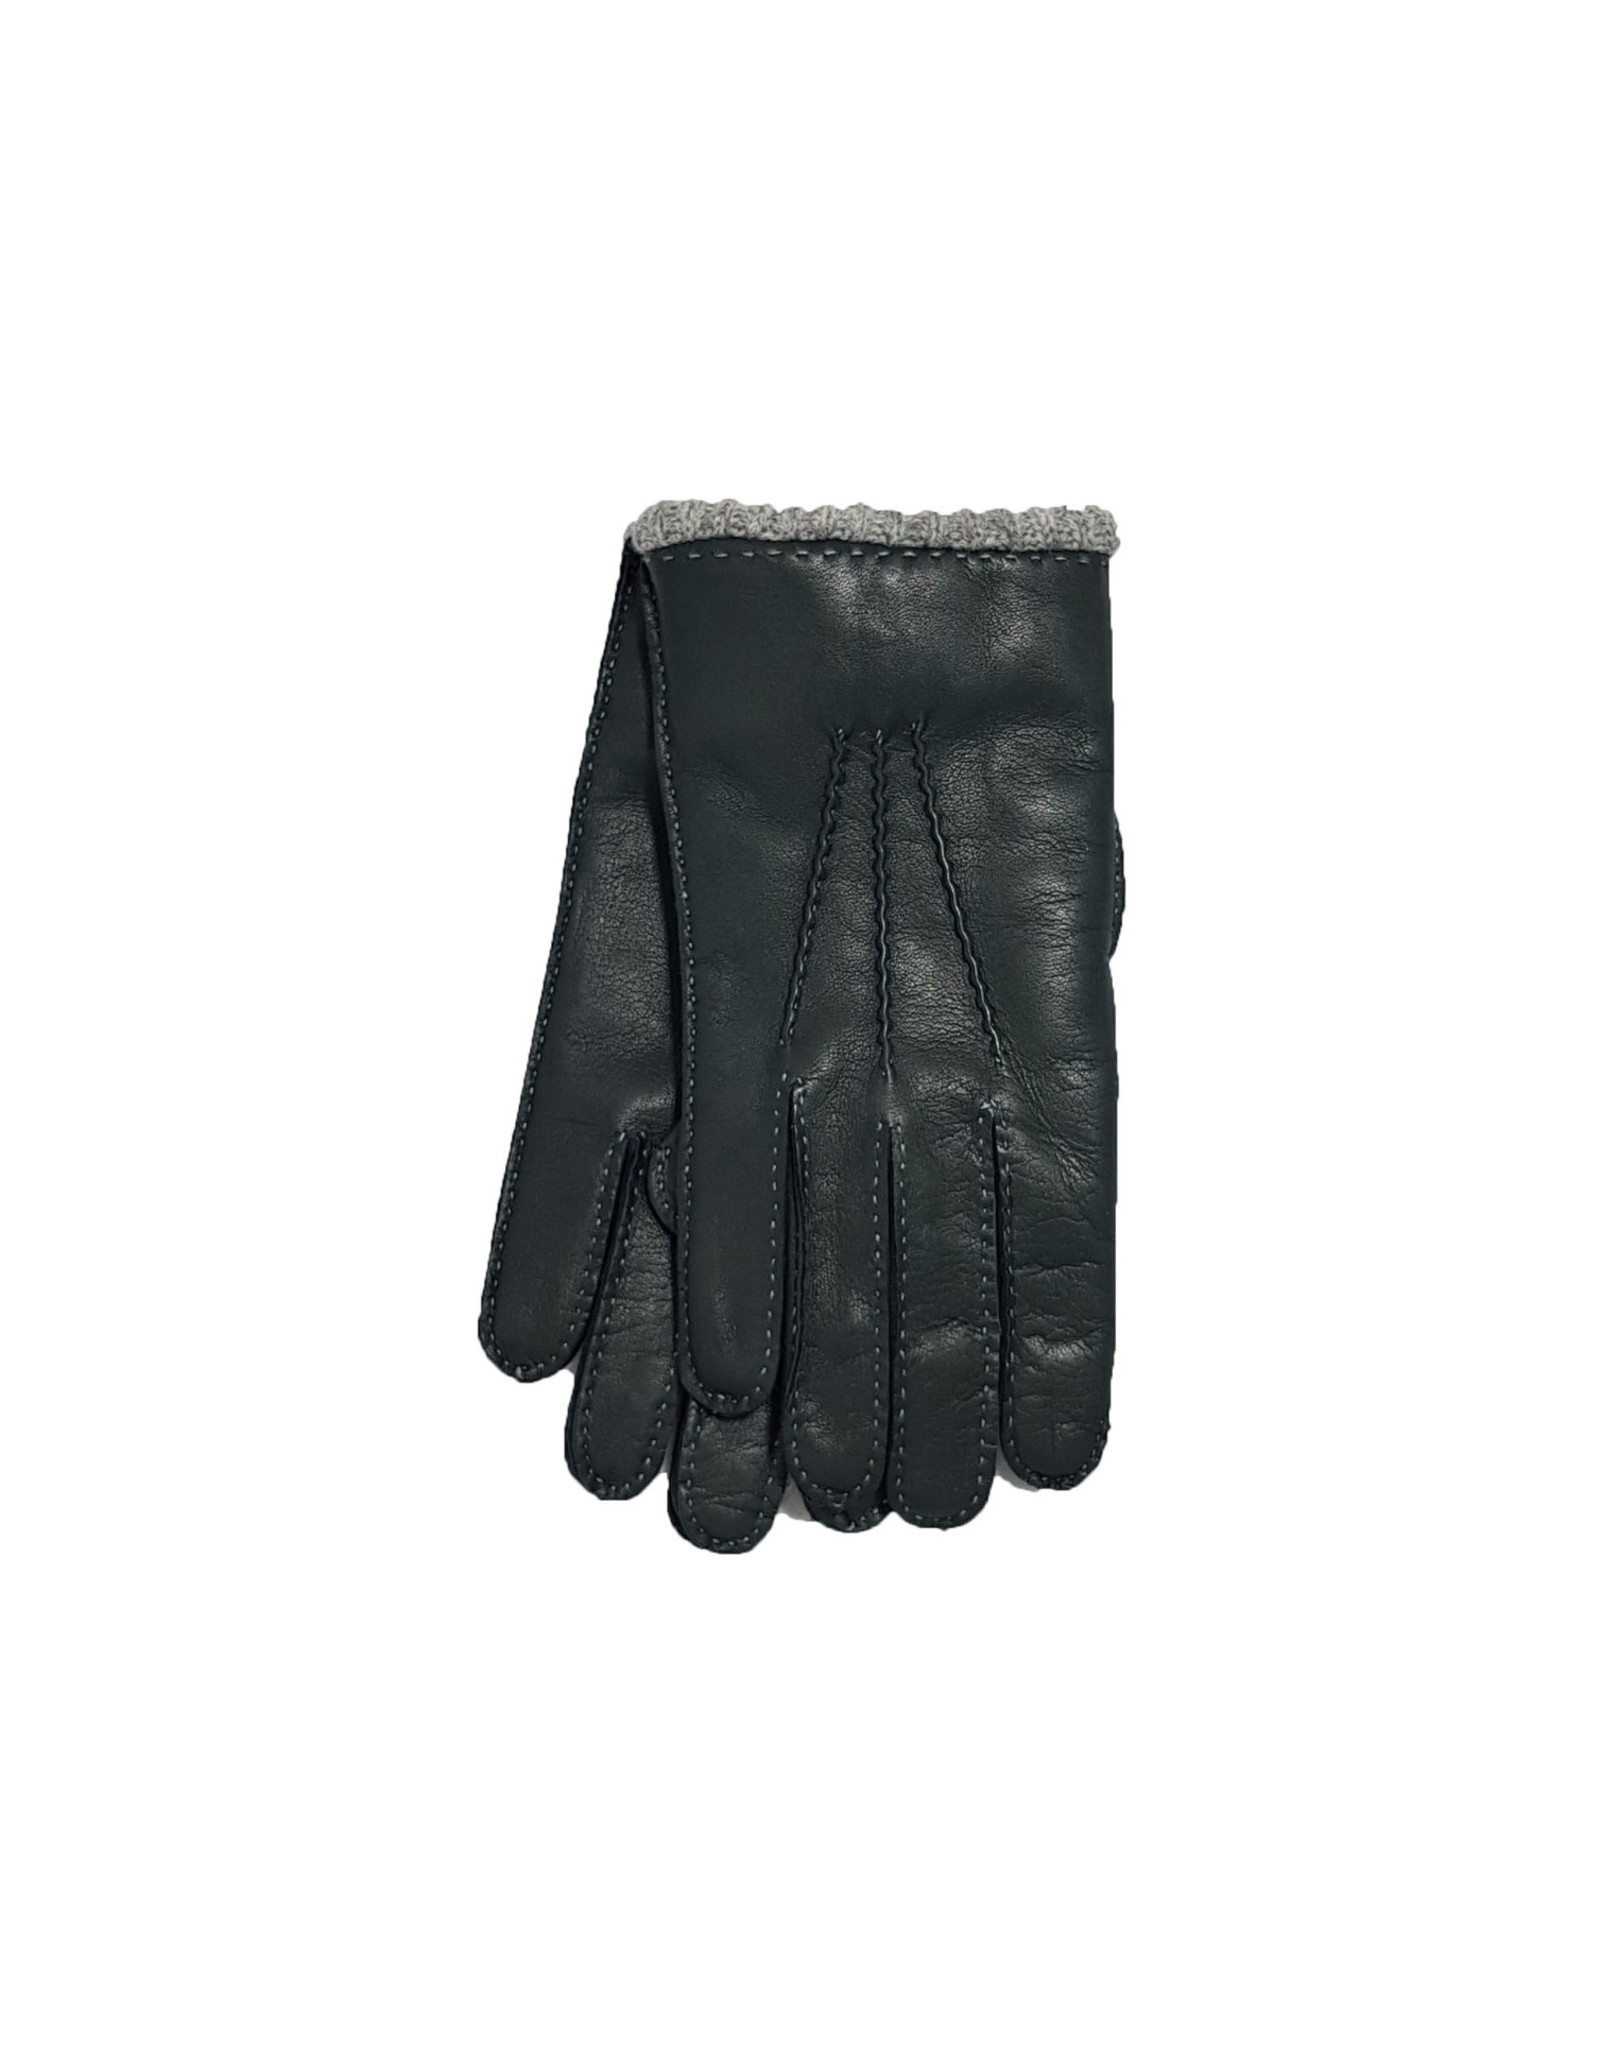 Mazzoleni Mazzoleni handschoenen leder groen 904/20